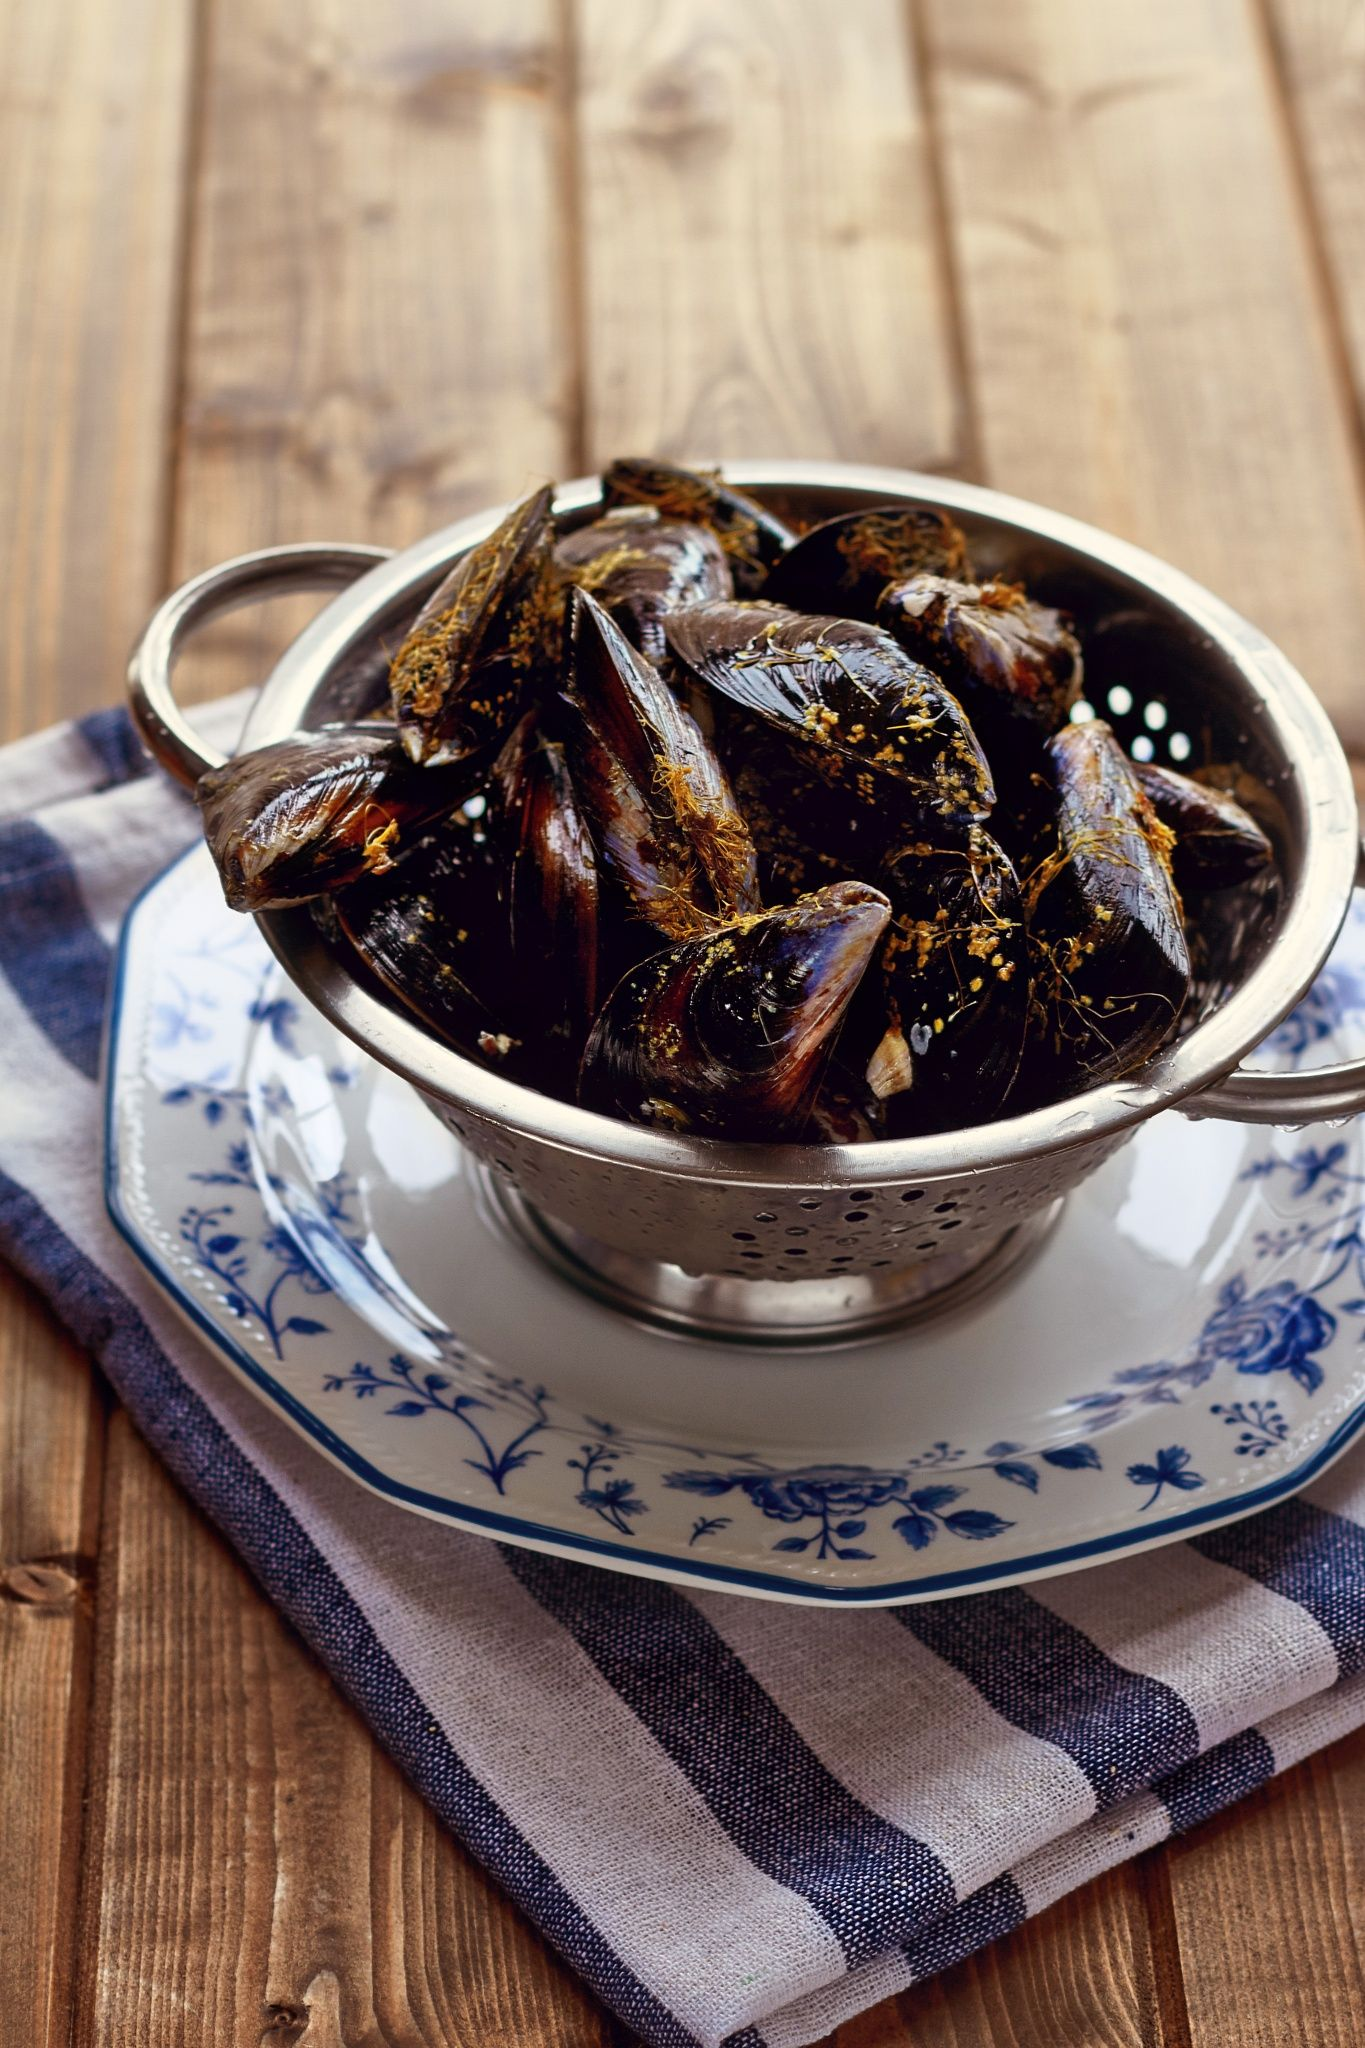 Mussels by Helena Krol on 500px #foodphotographer #food #foodphotography #grill #marisco #mejillones #mejillonesalamarinera #mussles #prawn #seafood